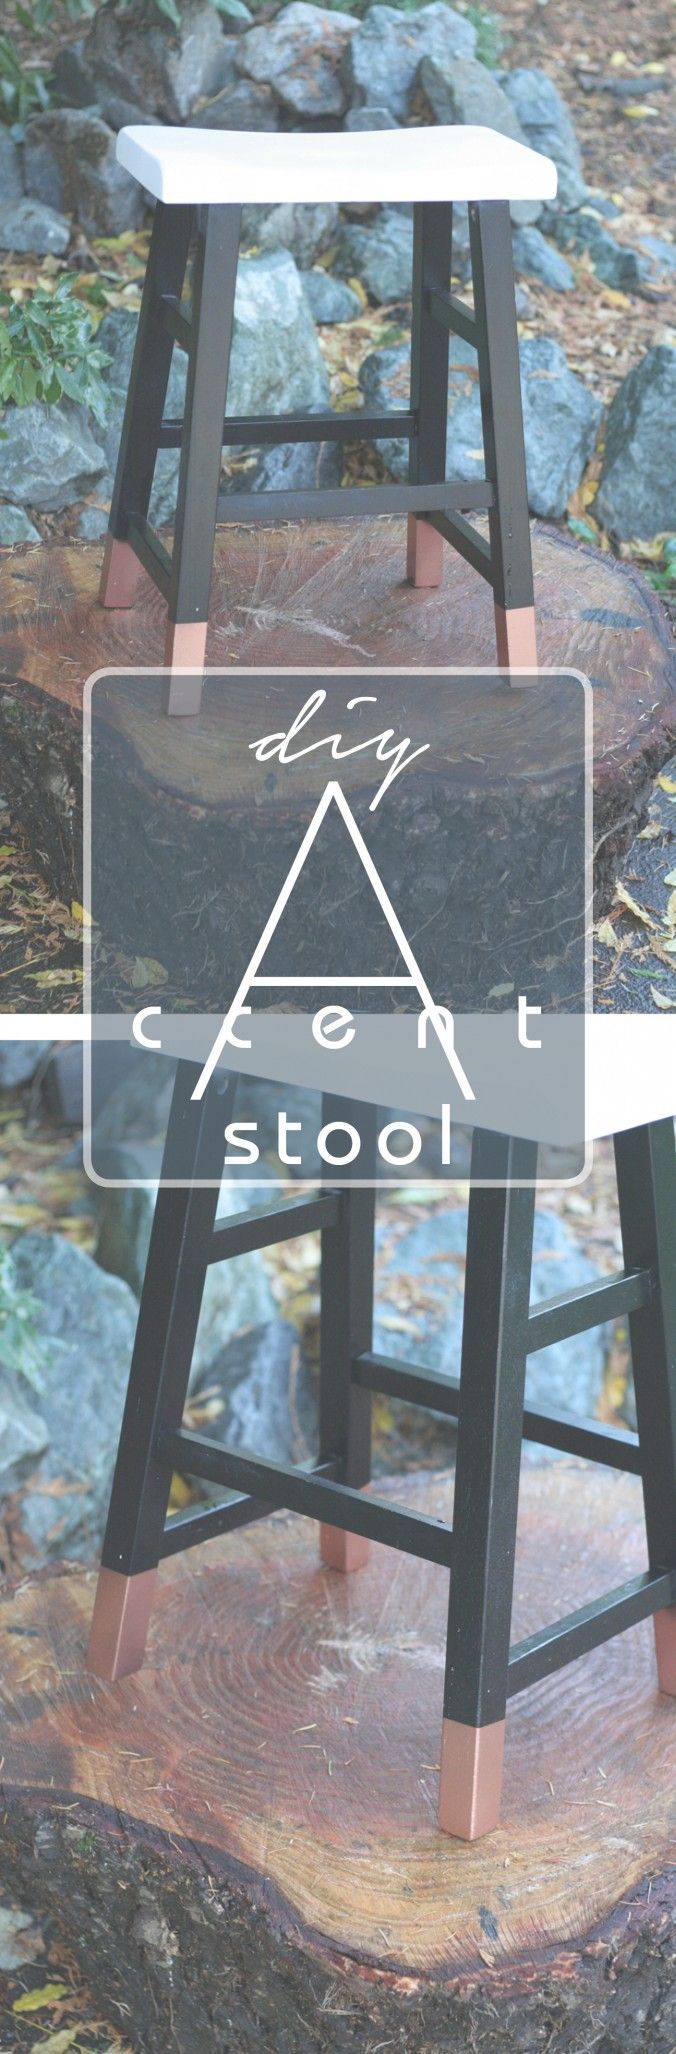 american sportswear company logos DIY Accent Stool